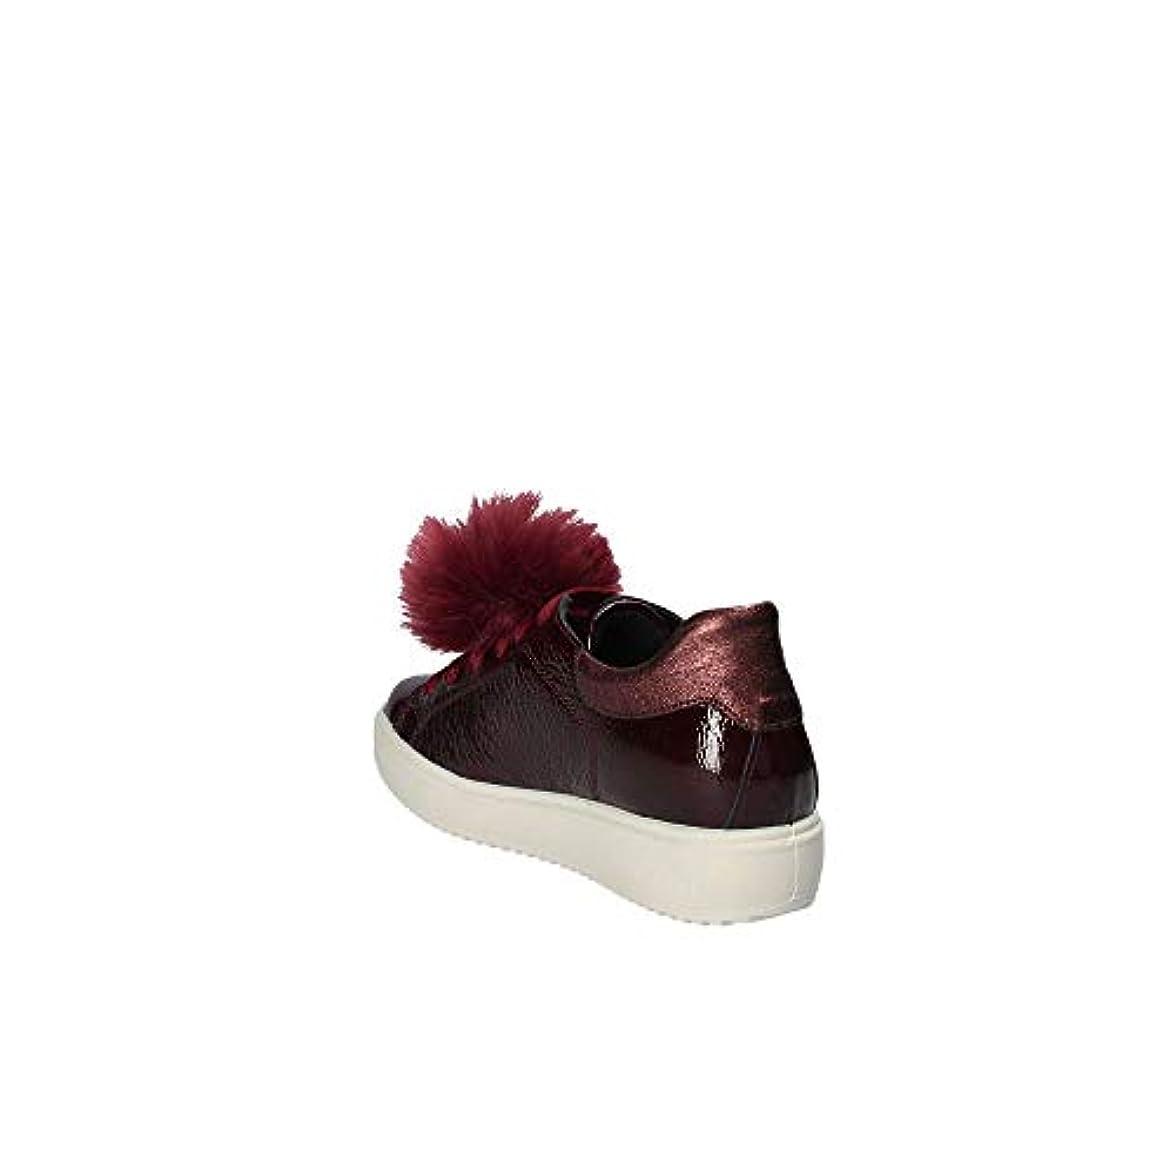 Igi Donna 2154844 amp;co Sneakers